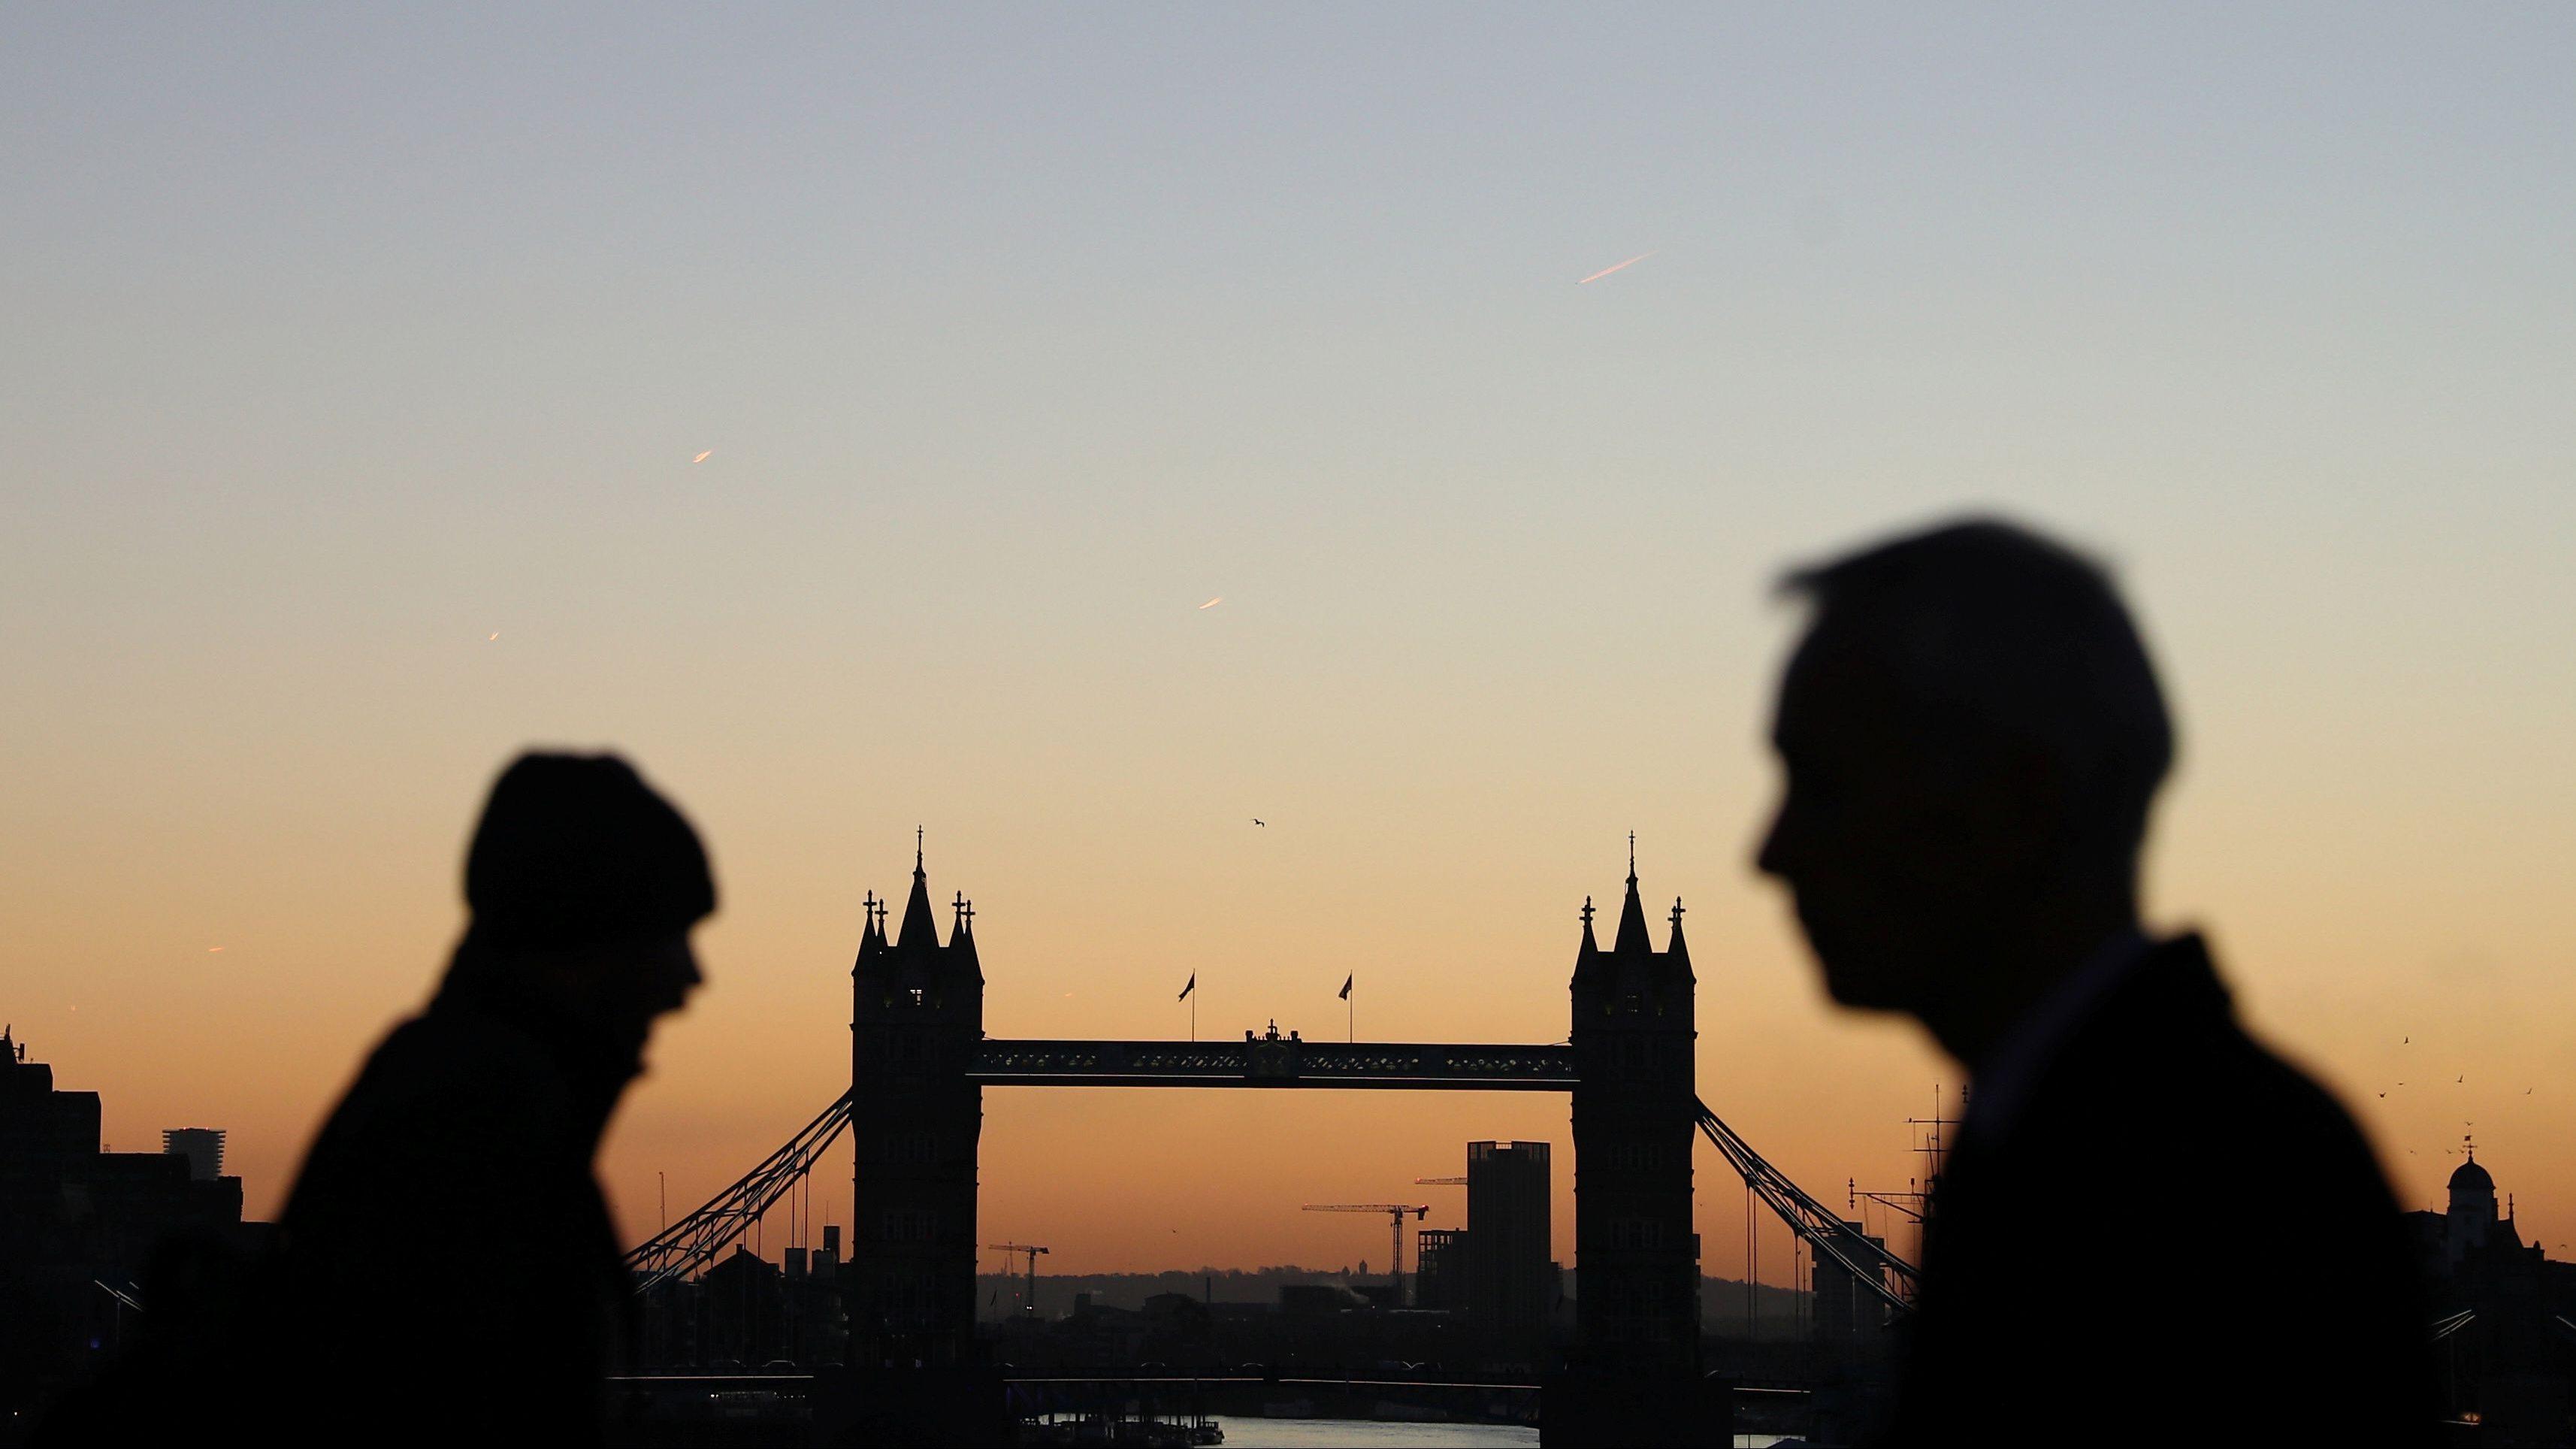 Commuters walk past Tower Bridge as the sun rises in London